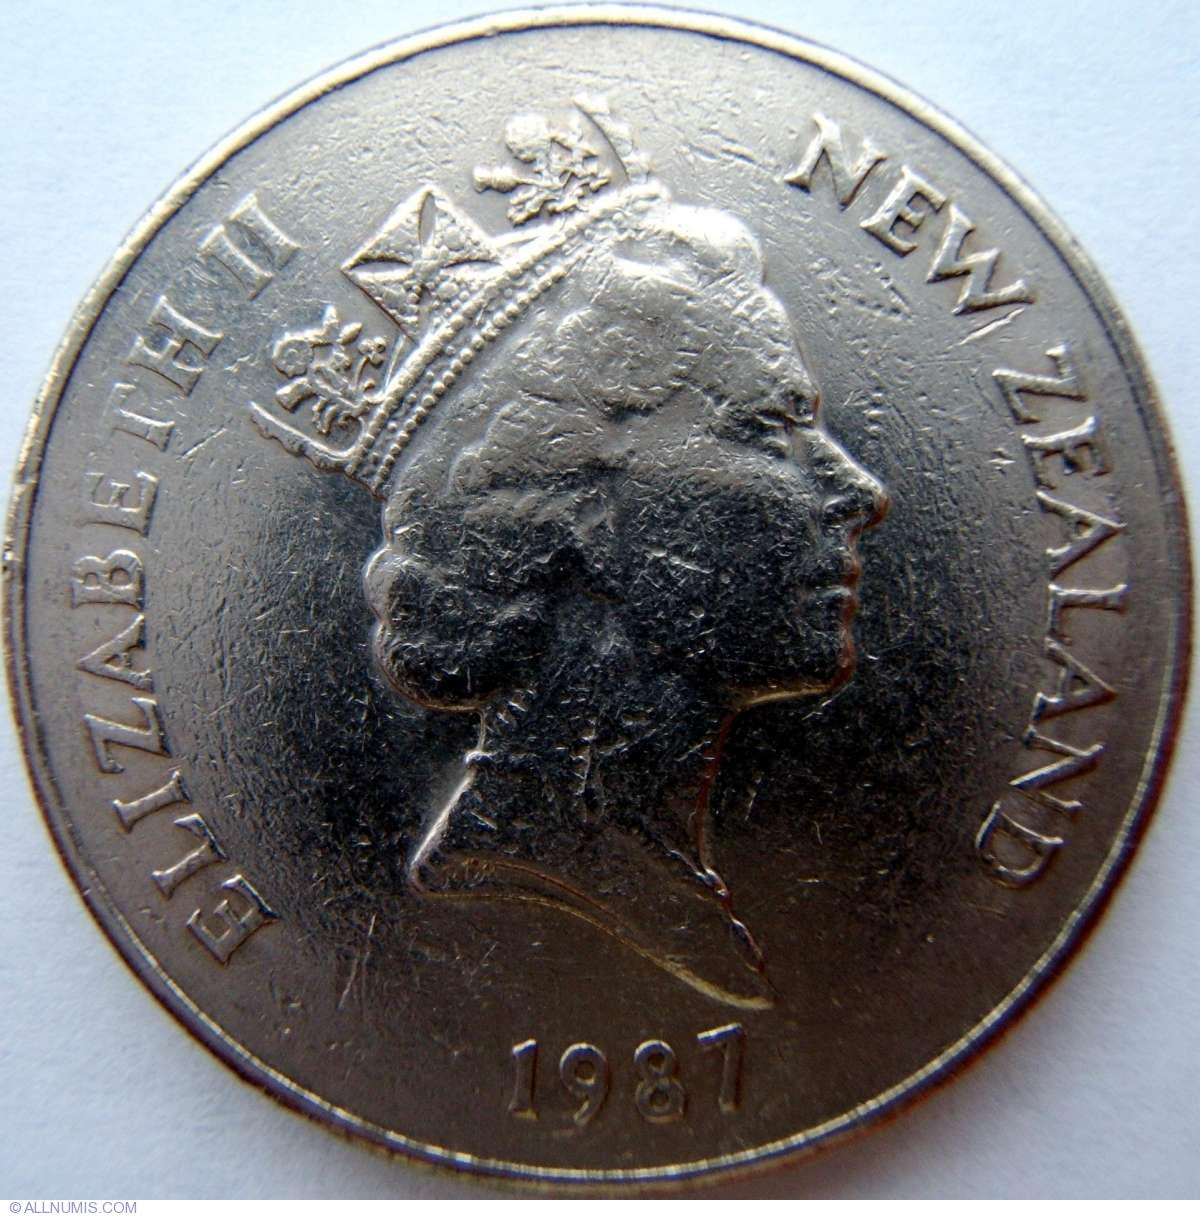 Q New Zealand 1987-20 Cents Copper-Nickel Coin Elizabeth II Kiwi bird